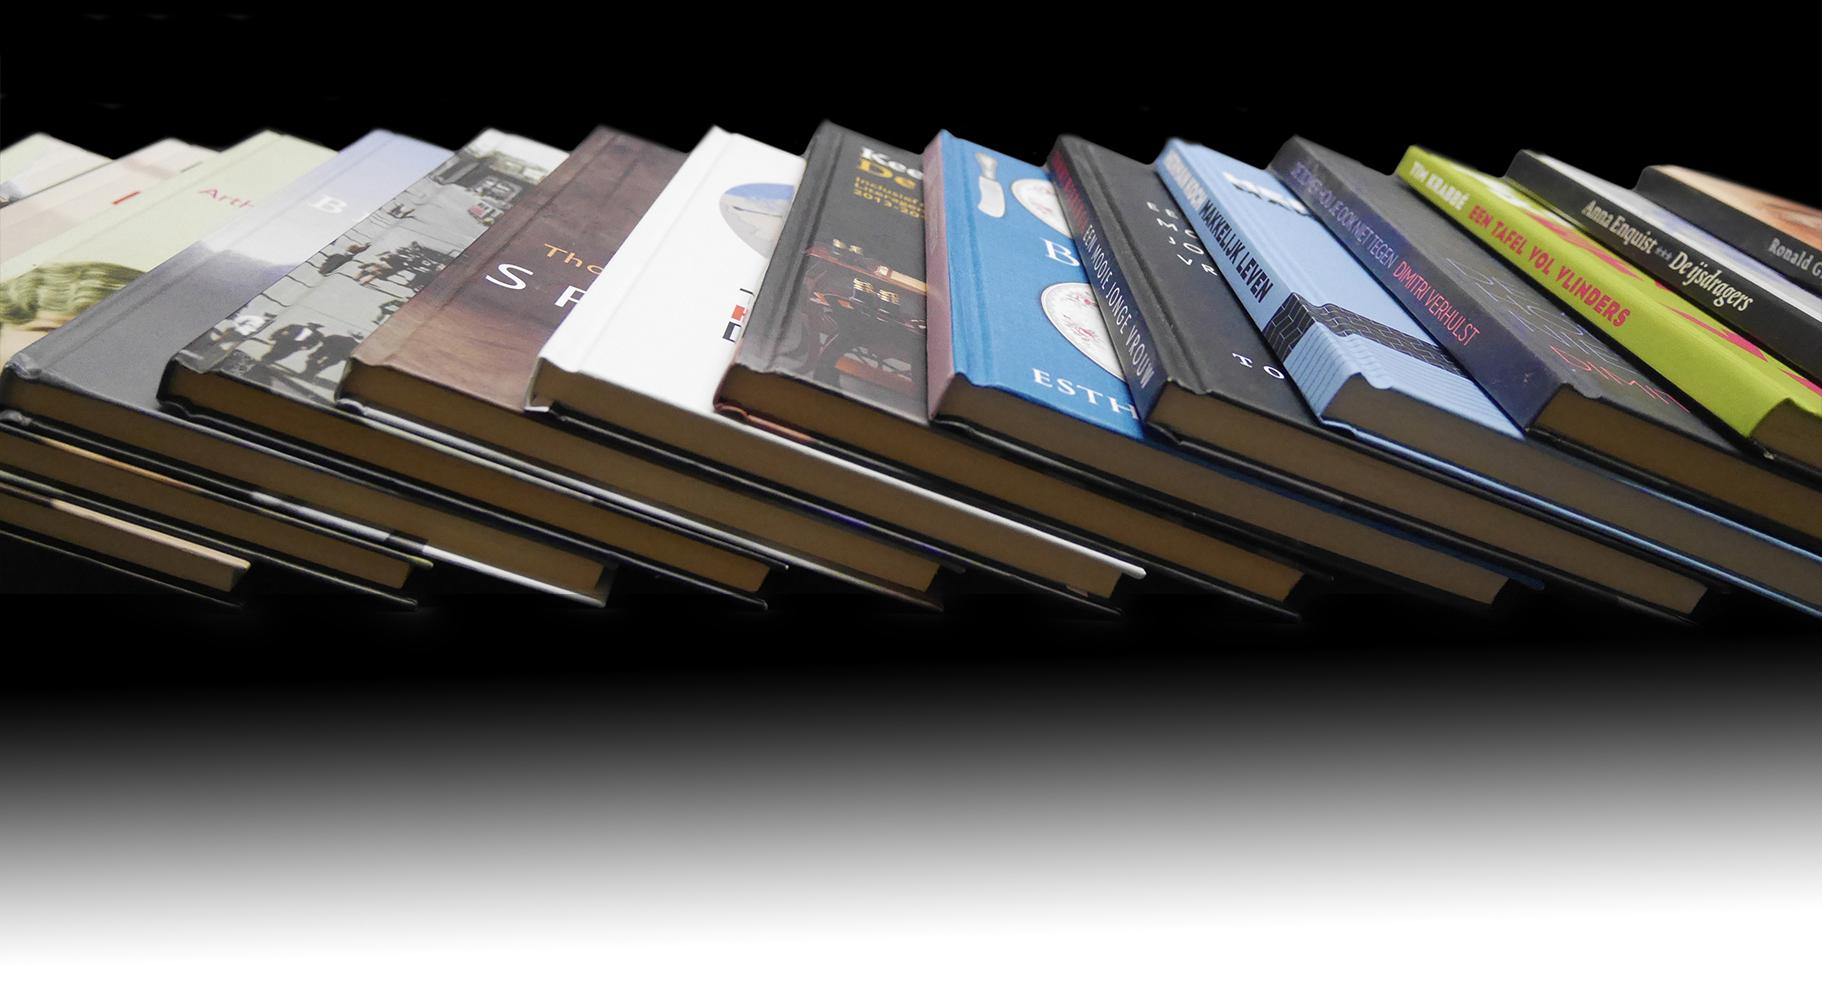 Boekenweek 2018 — Boekenbal